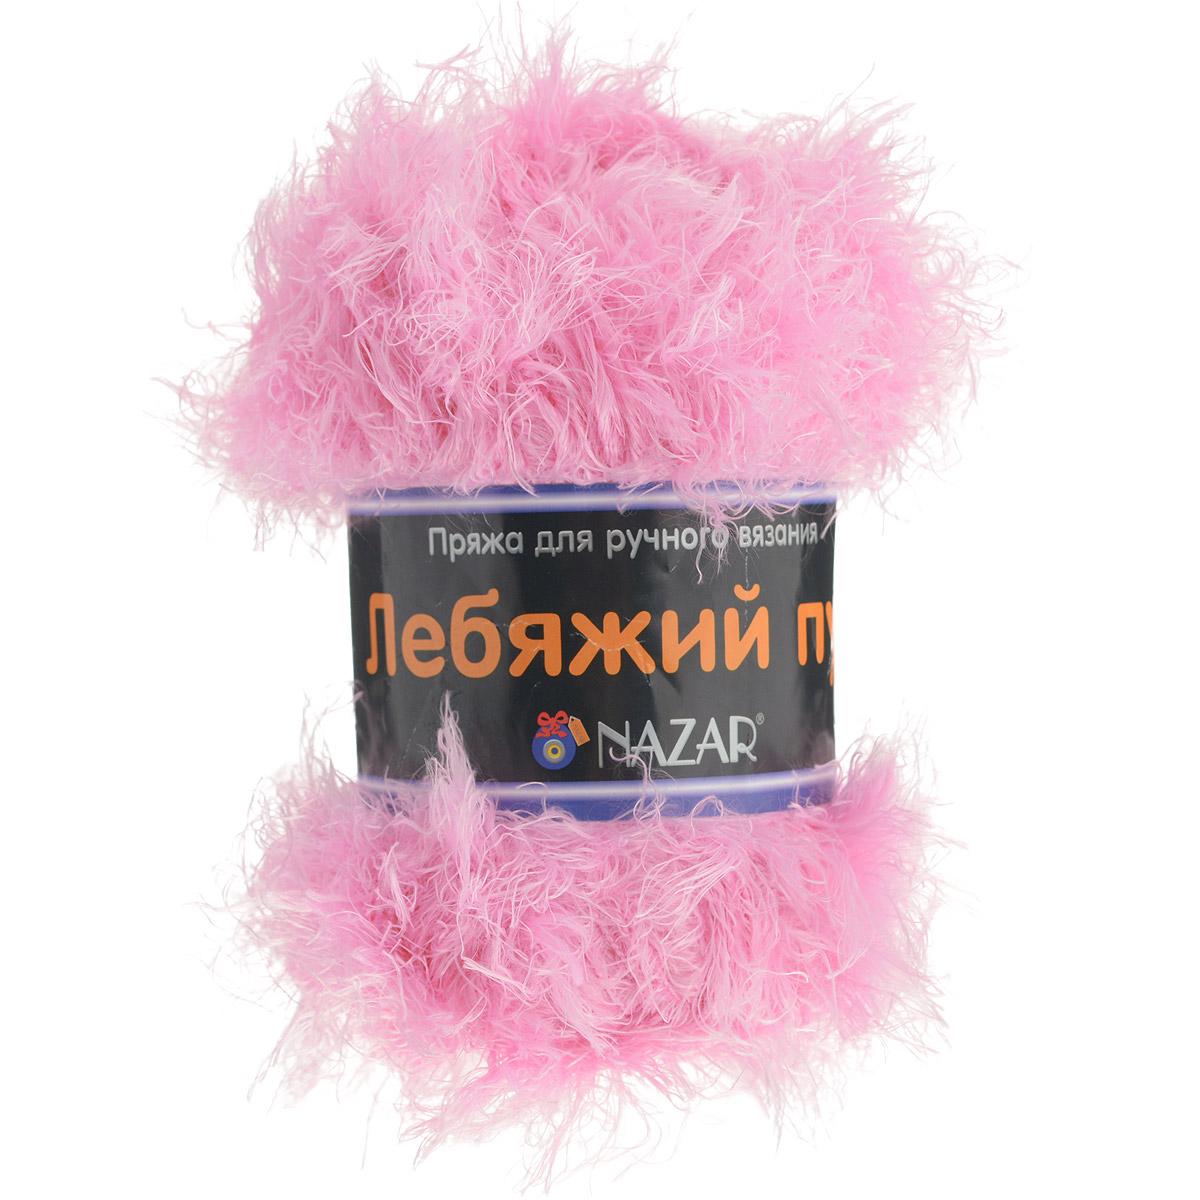 Пряжа для вязания Nazar Лебяжий пух, цвет: розовый (2692), 100 г, 170 м, 5 шт349020_2692